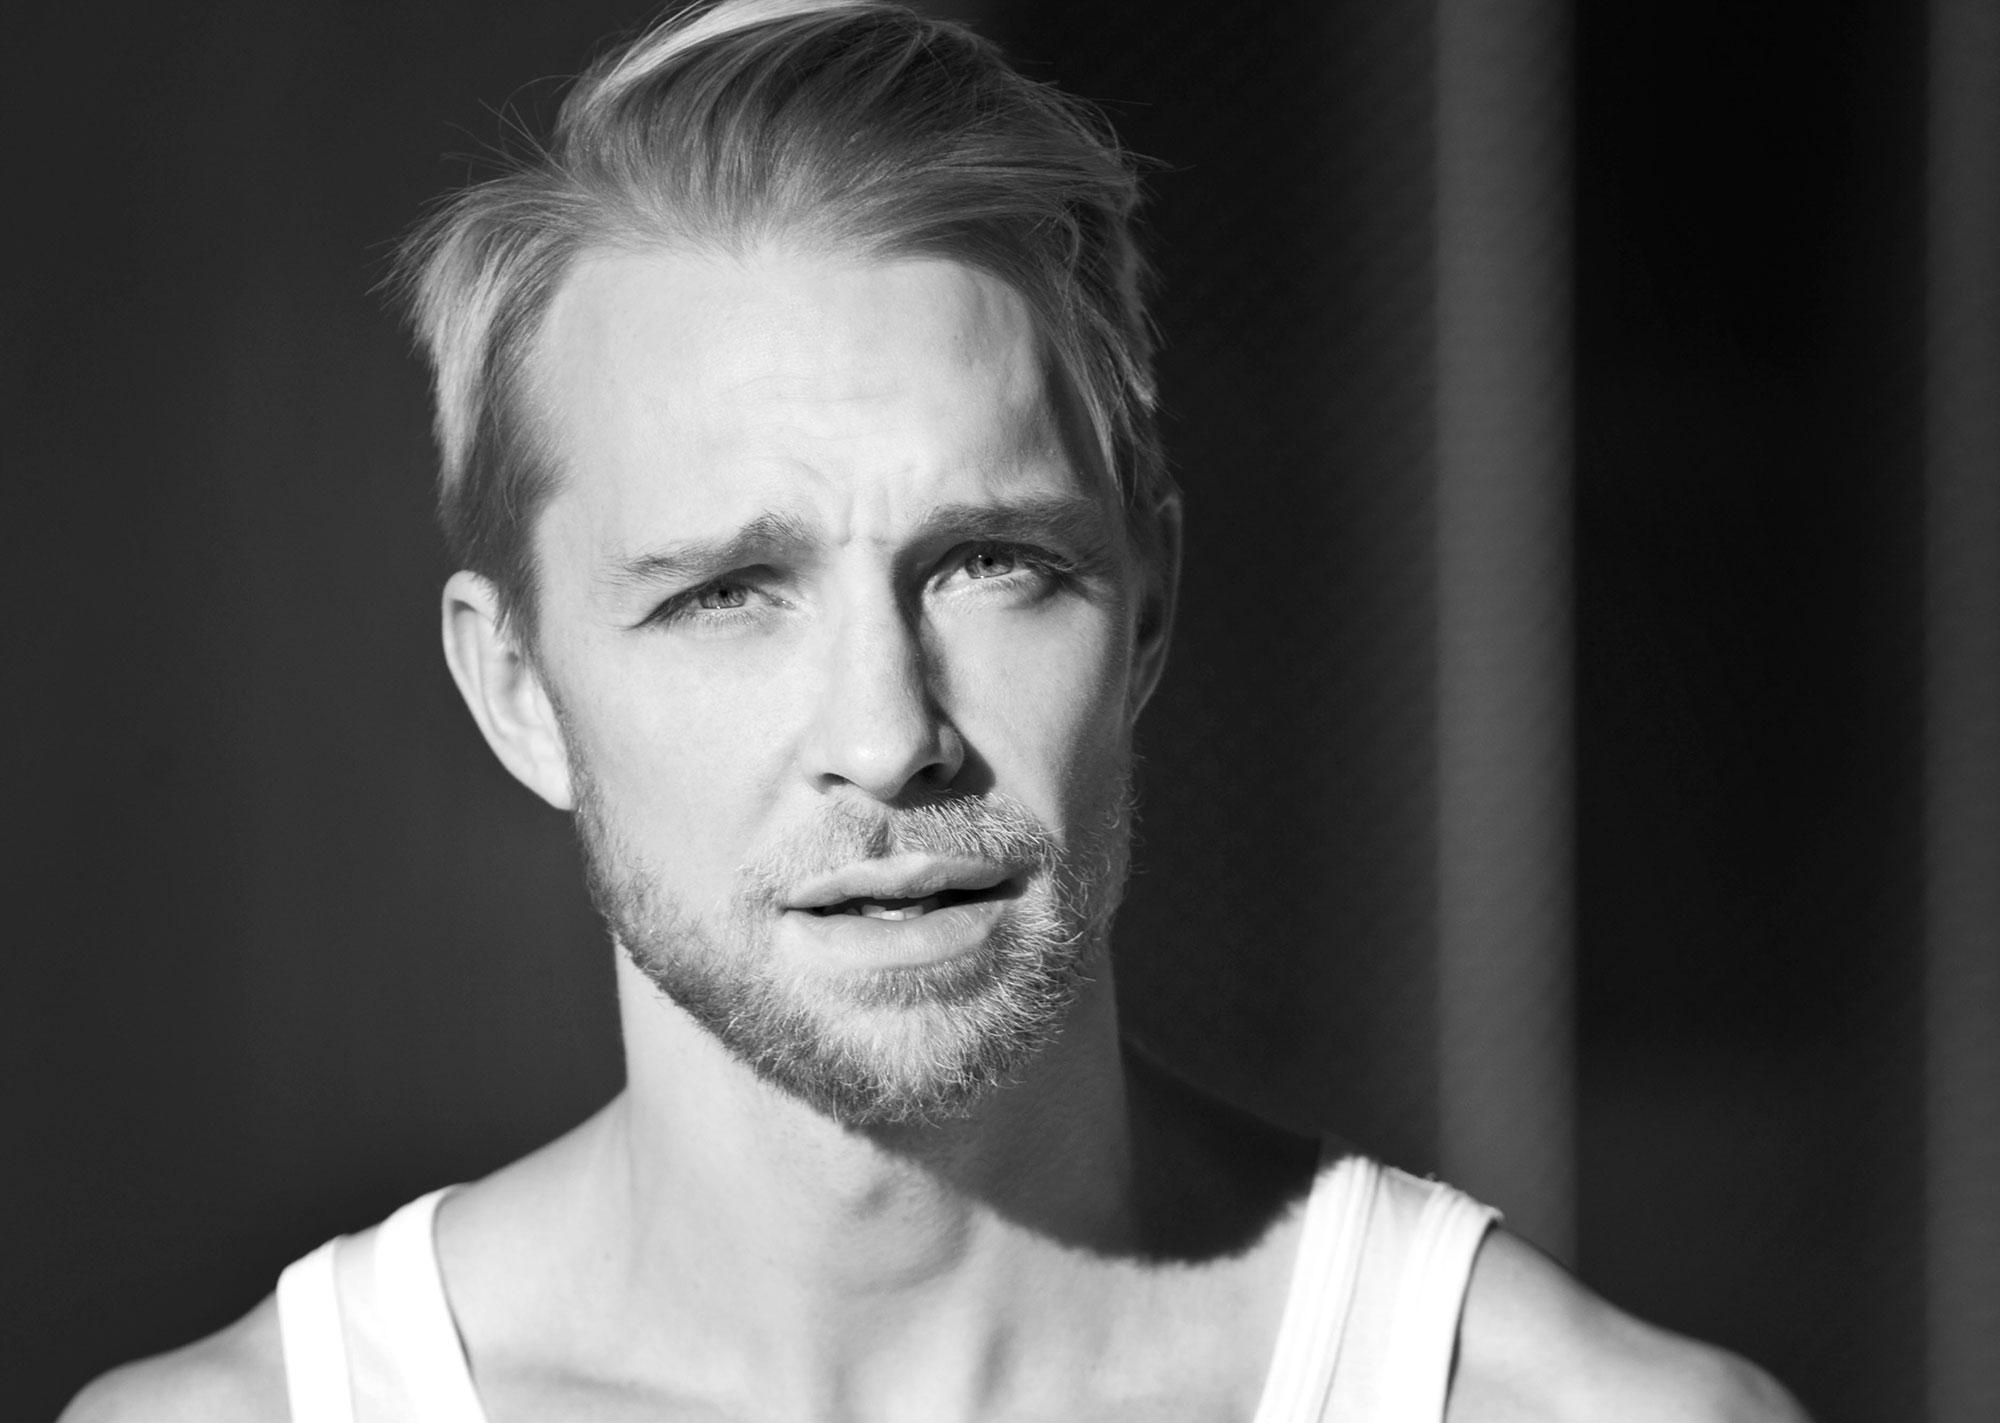 headshot of Pontus Lidberg